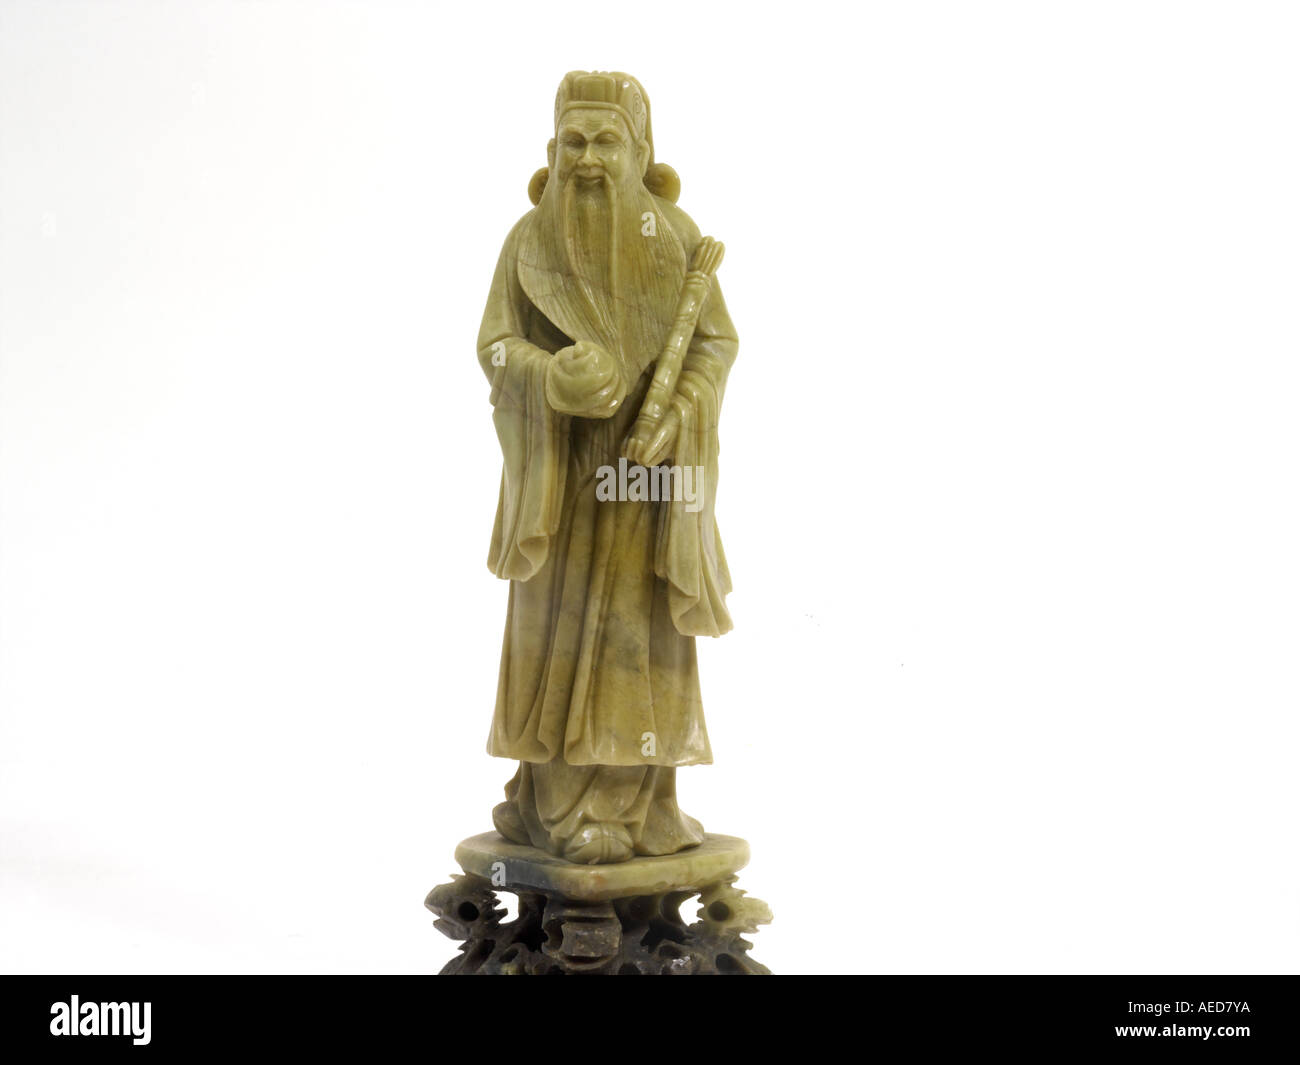 jade sculpture of wen ch ang god of literature jade is a symbol of jade sculpture of wen ch ang god of literature jade is a symbol of calm serenity wisdom balance and healing